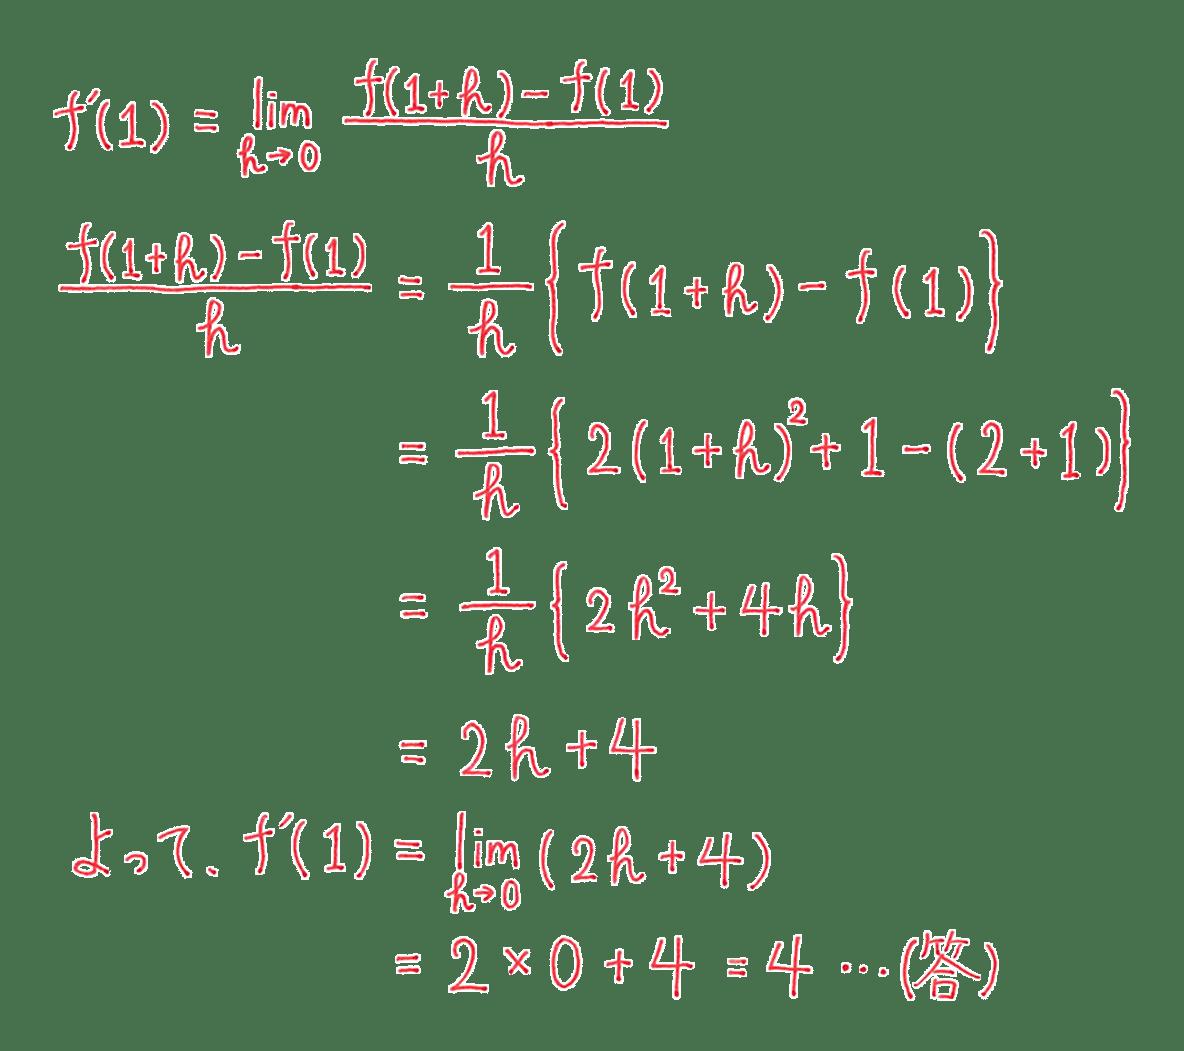 高校数学Ⅱ 微分法と積分法3 例題 答え